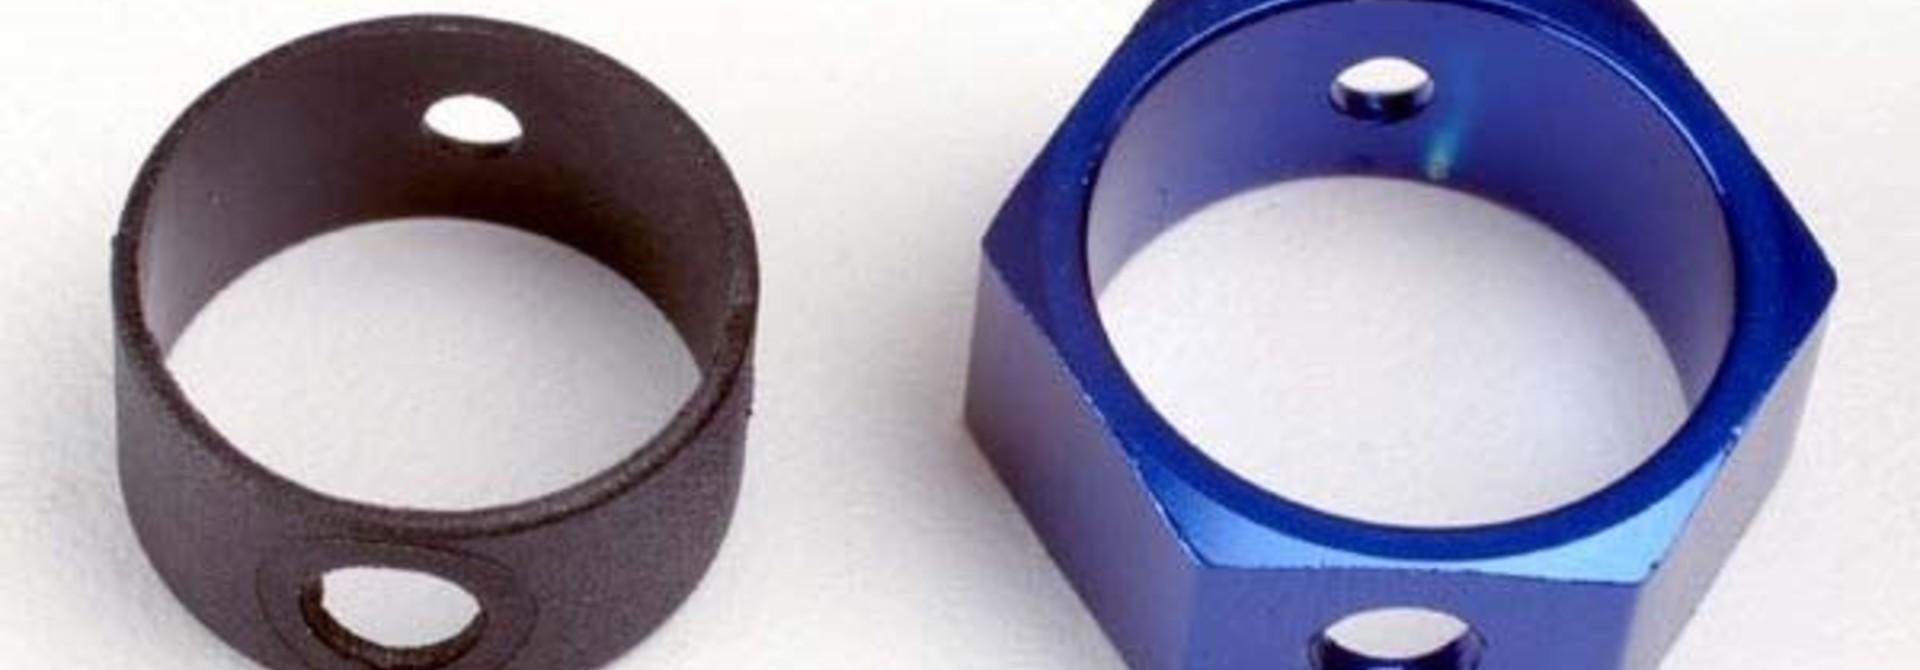 Brake adapter, hex aluminum (blue), TRX4966